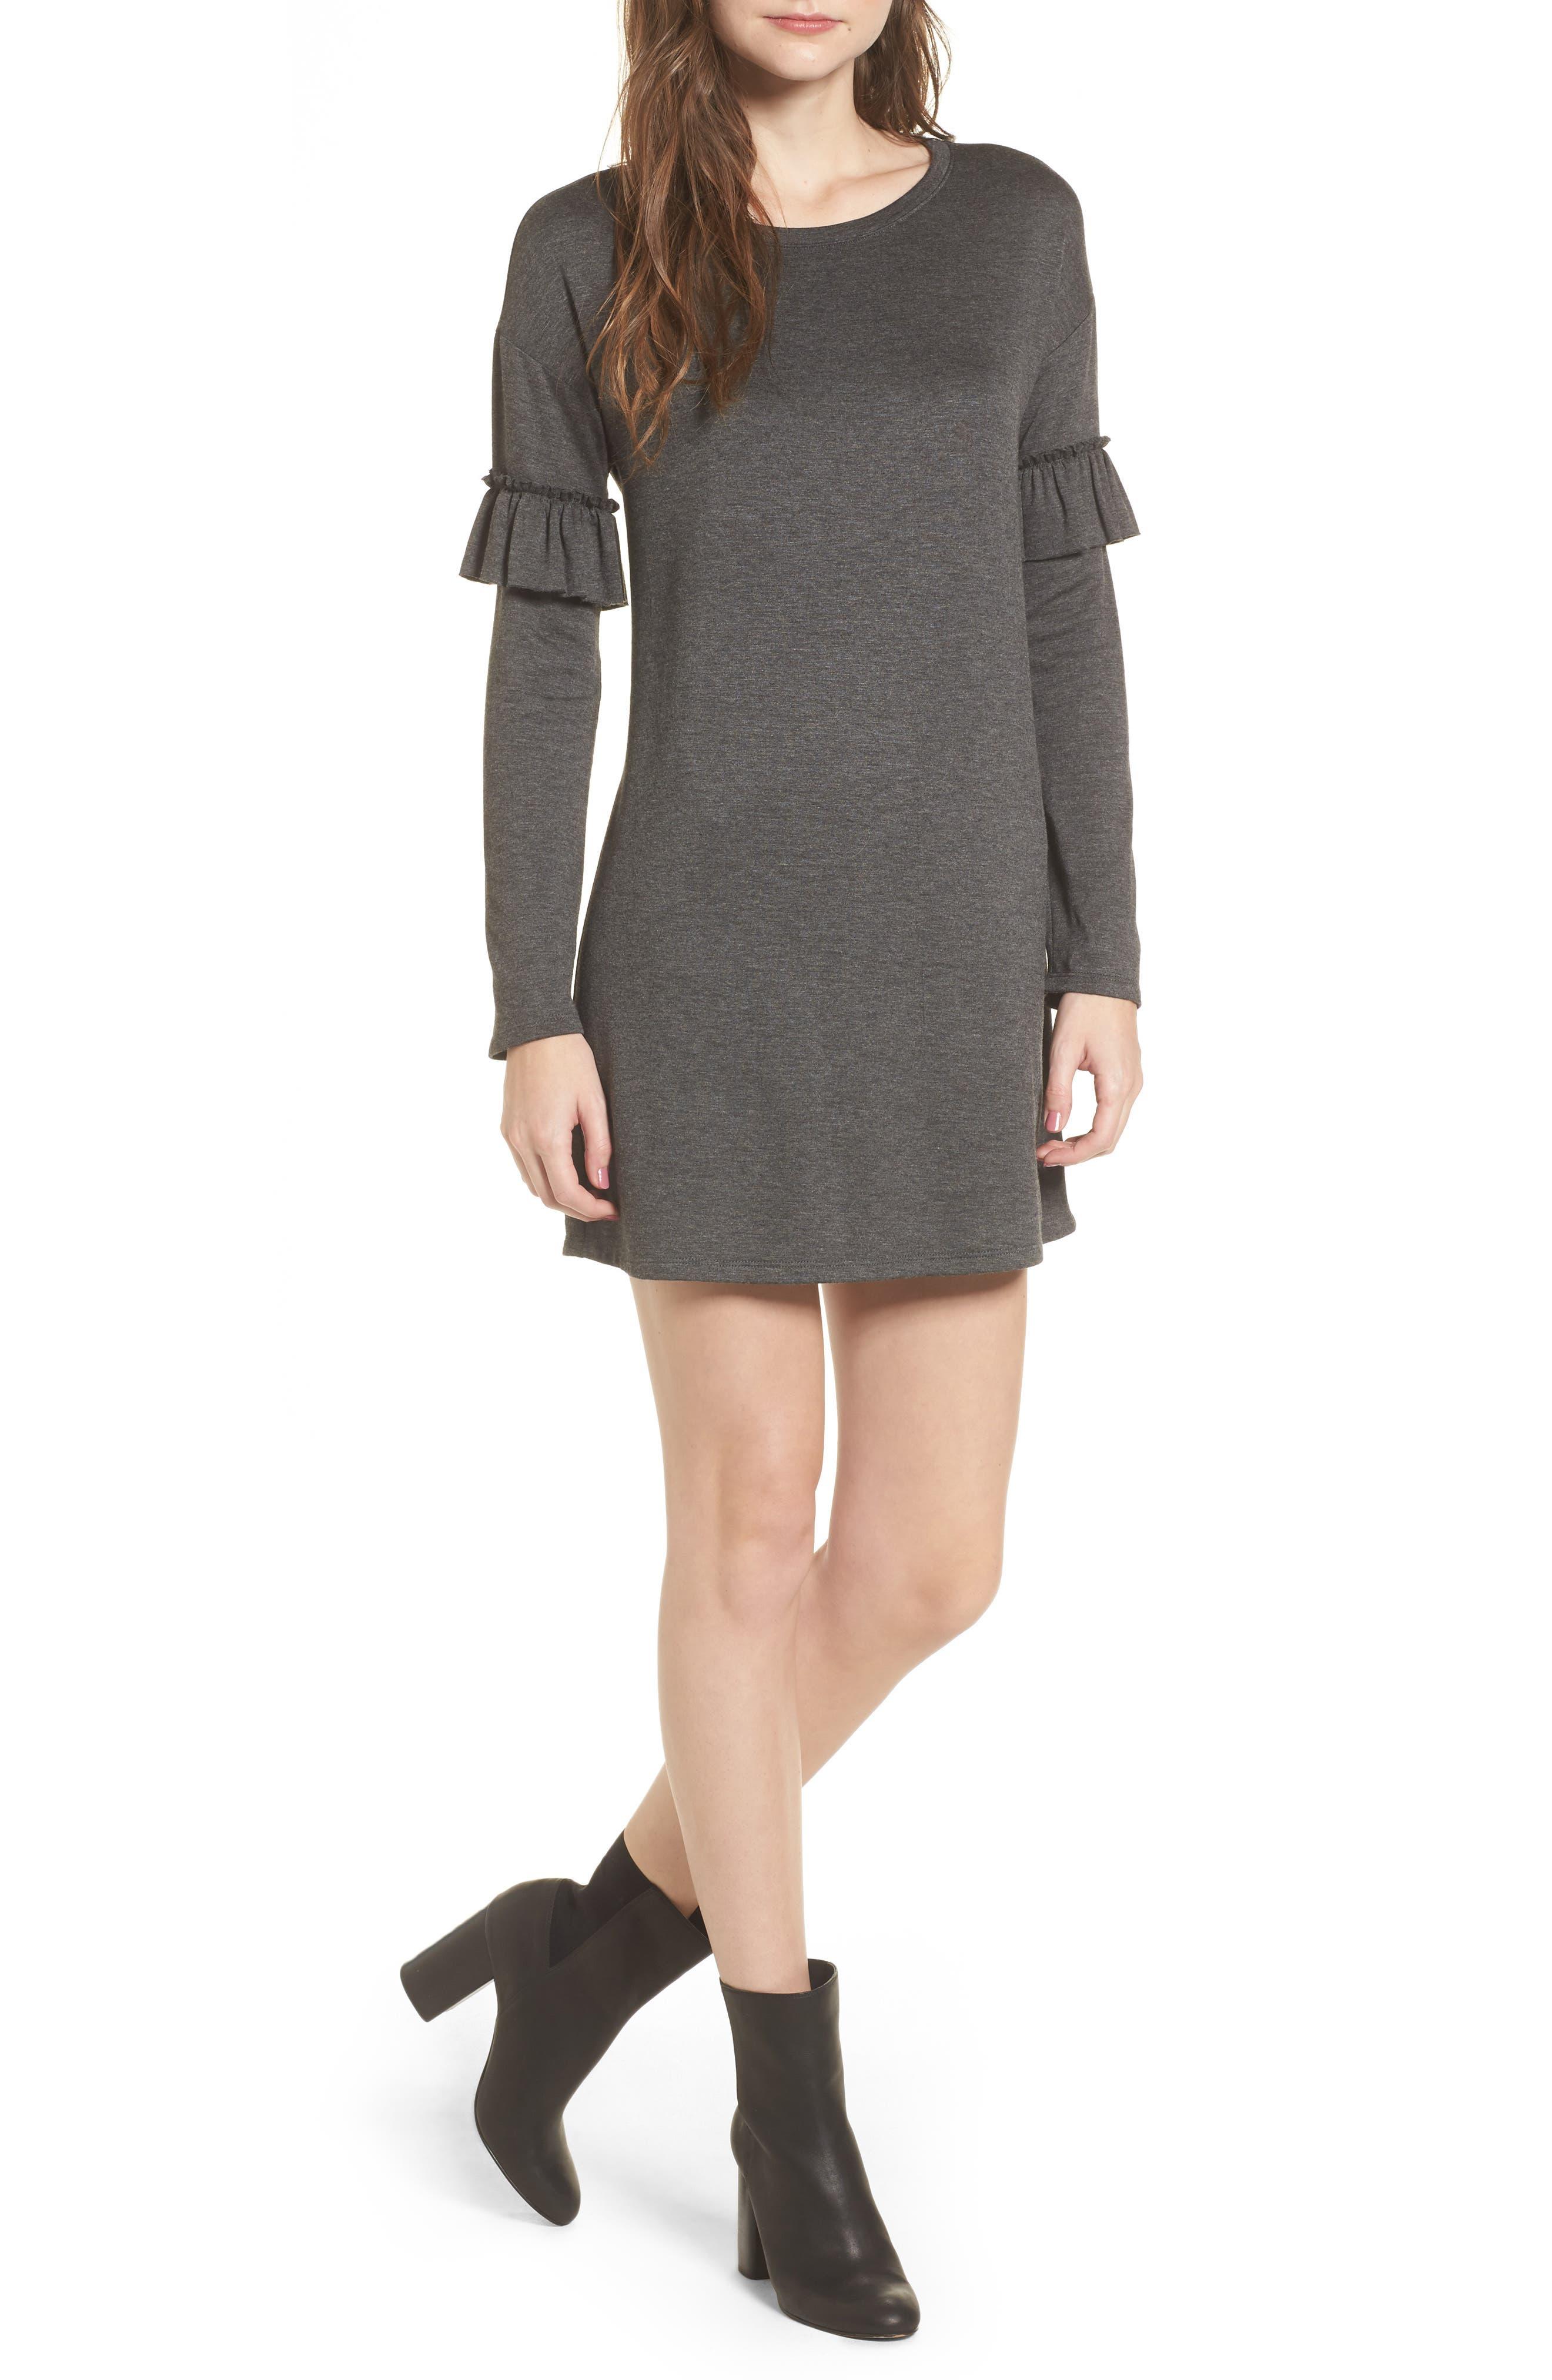 Ruffle Sleeve Sweater Dress,                             Main thumbnail 1, color,                             Charcoal